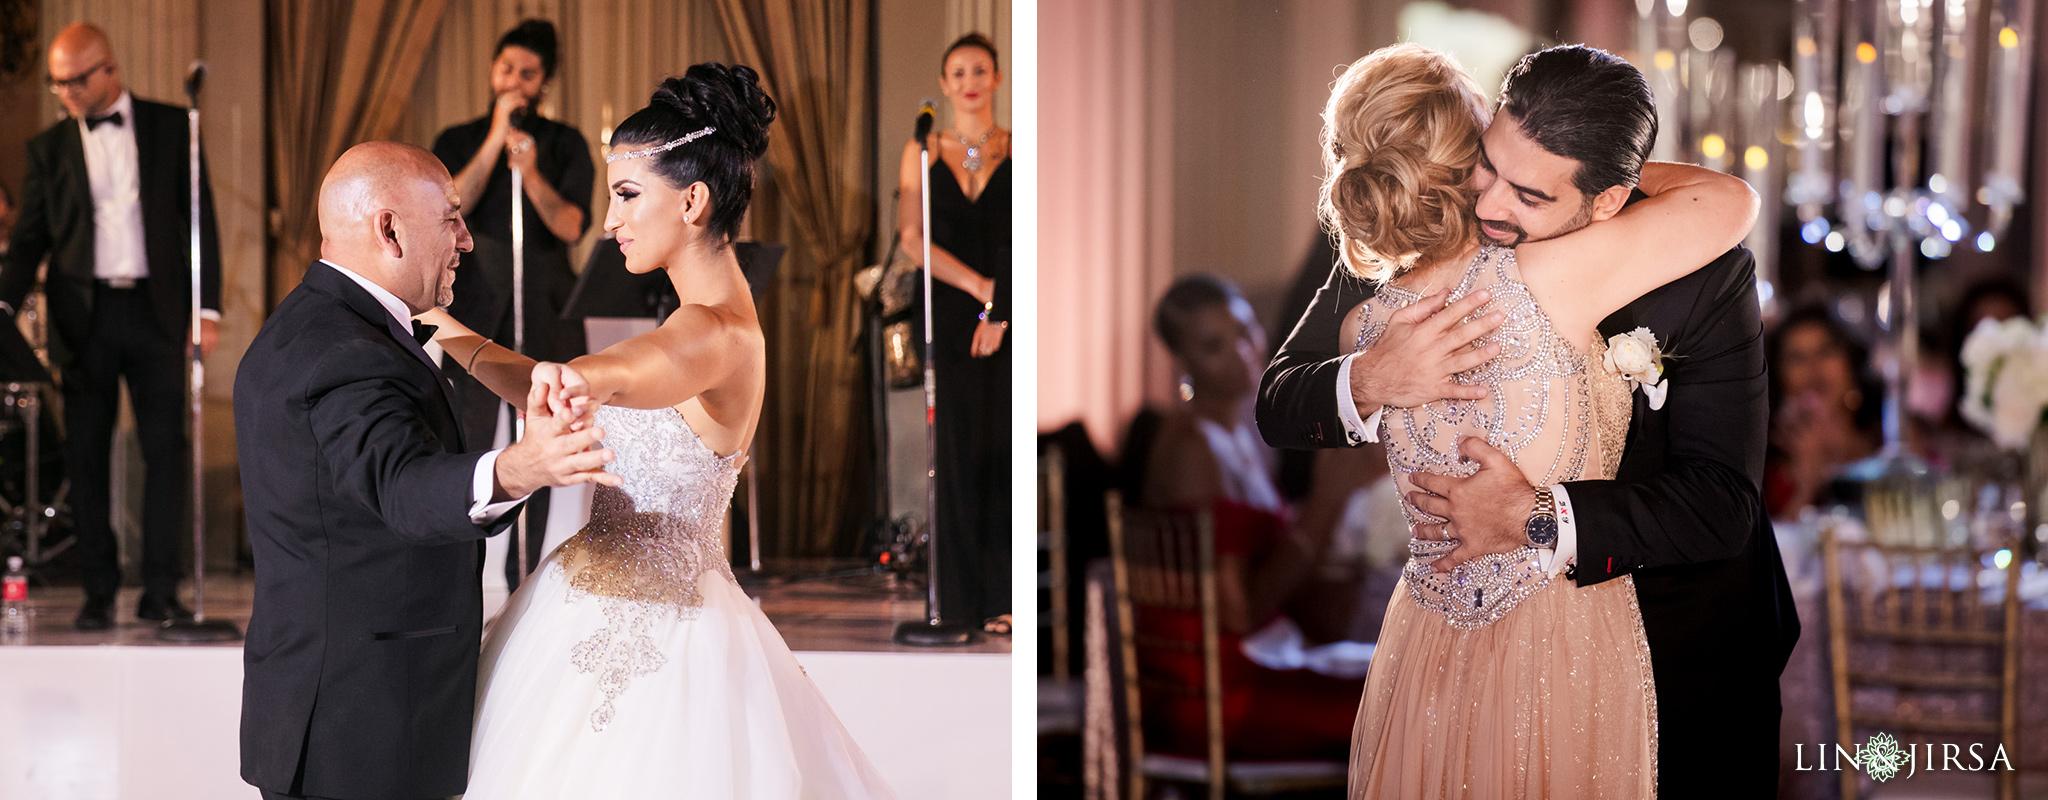 31 Biltmore Hotel Los Angeles Wedding Photography